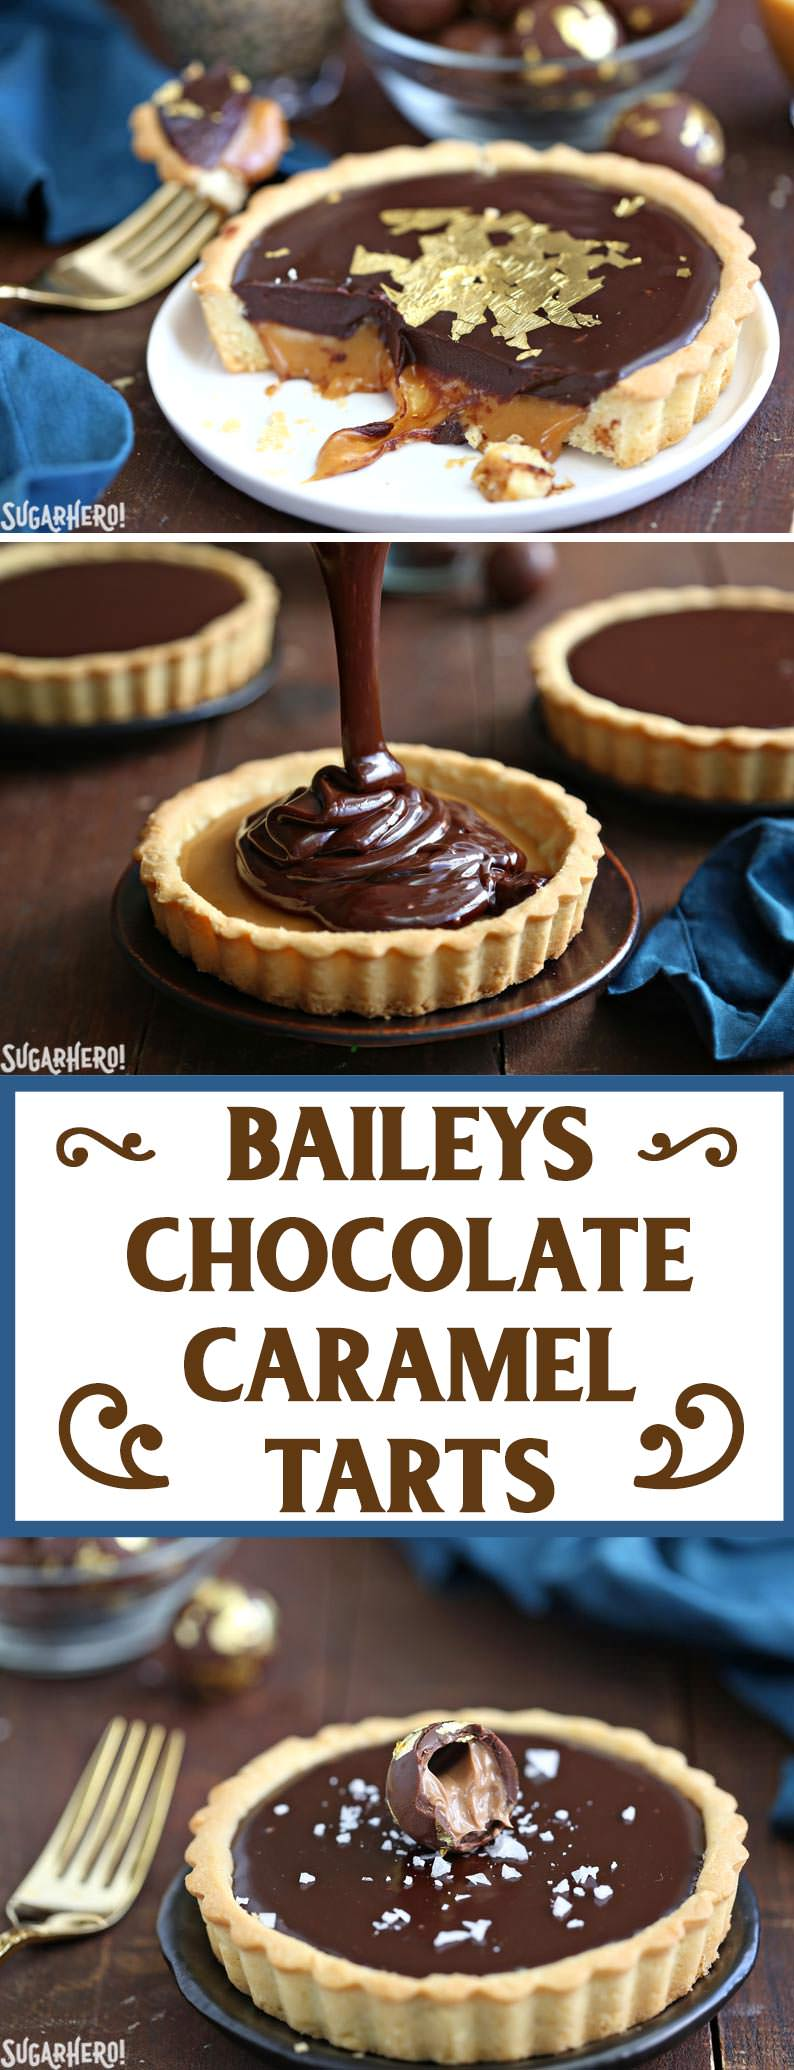 Chocolate Caramel Tarts Recipe — Dishmaps